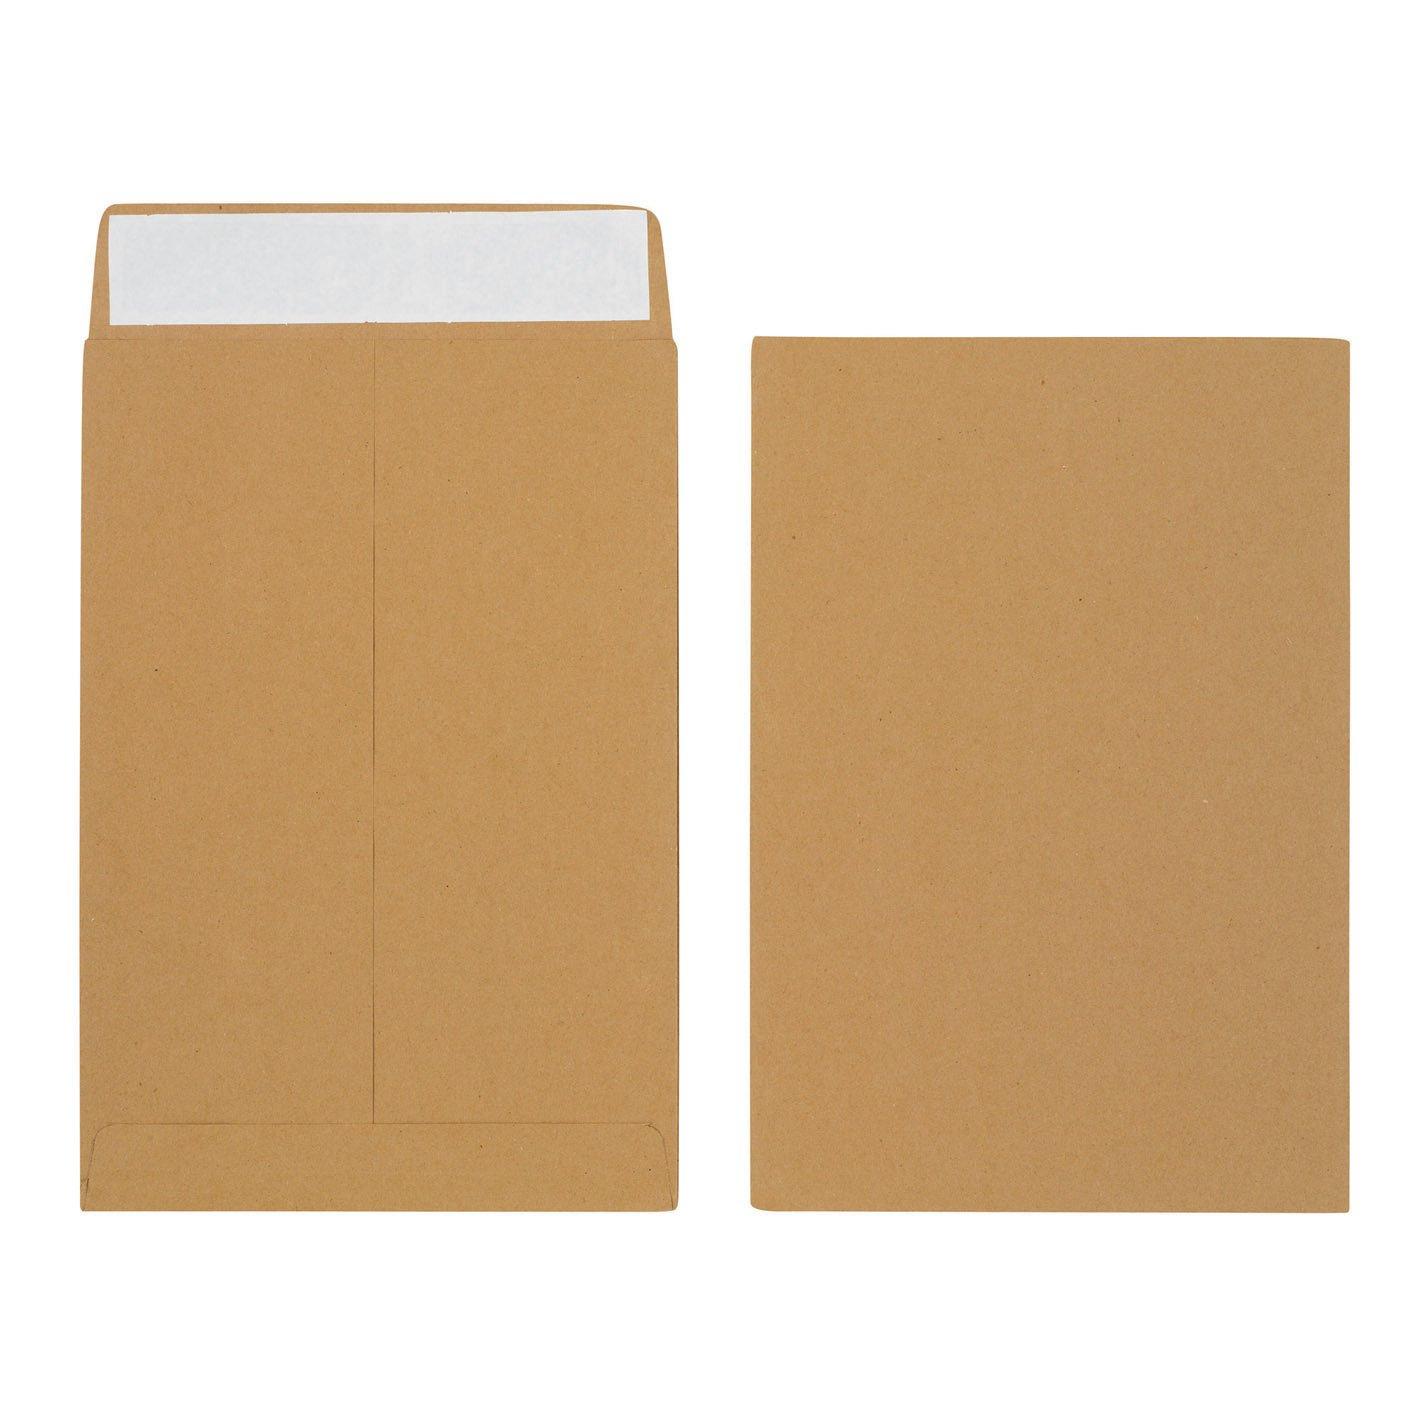 Initiative Envelope 25mm V-Base Gusset Pocketed Plain Peel n Seal 340x248x25120gsm Manilla Pack 125